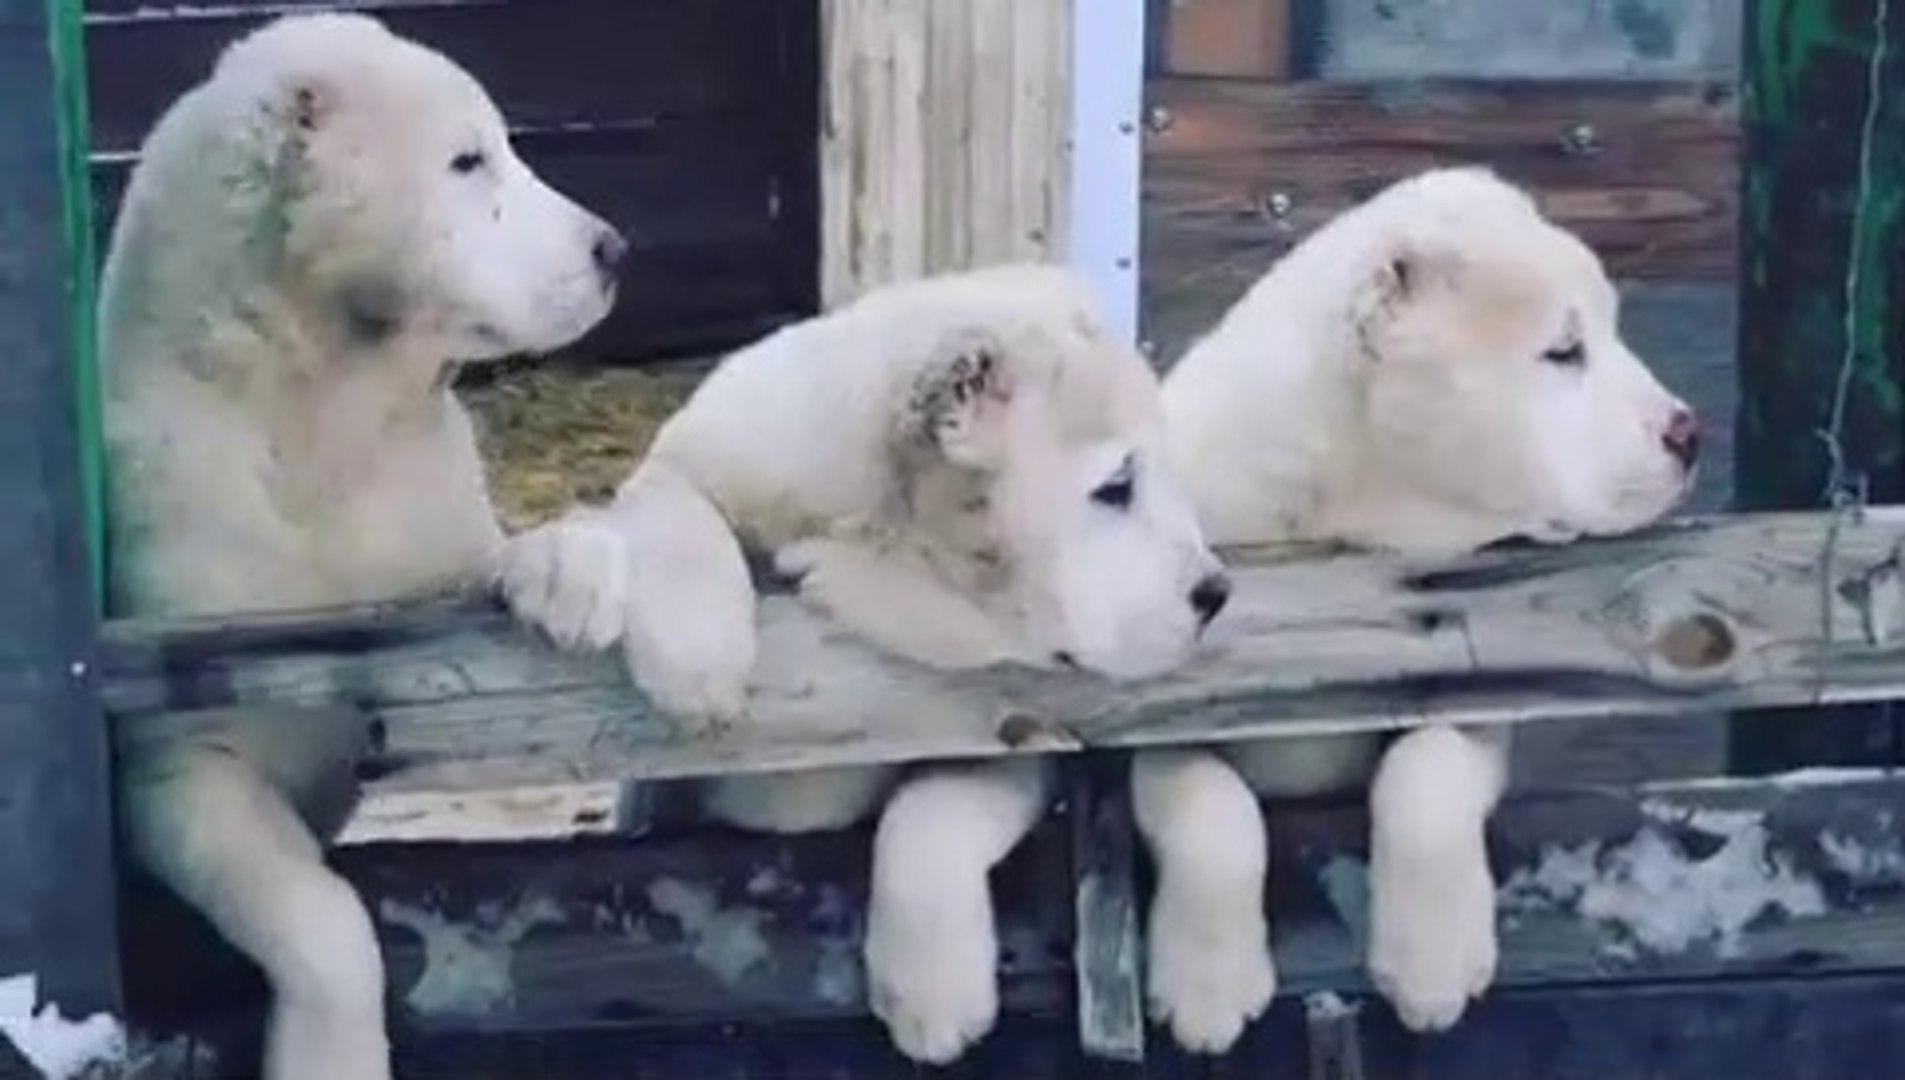 TURKMEN ALABAY COBAN KOPEK YAVRULARI - TURKMEN ALABAi SHEPHERD DOG PUPPiES